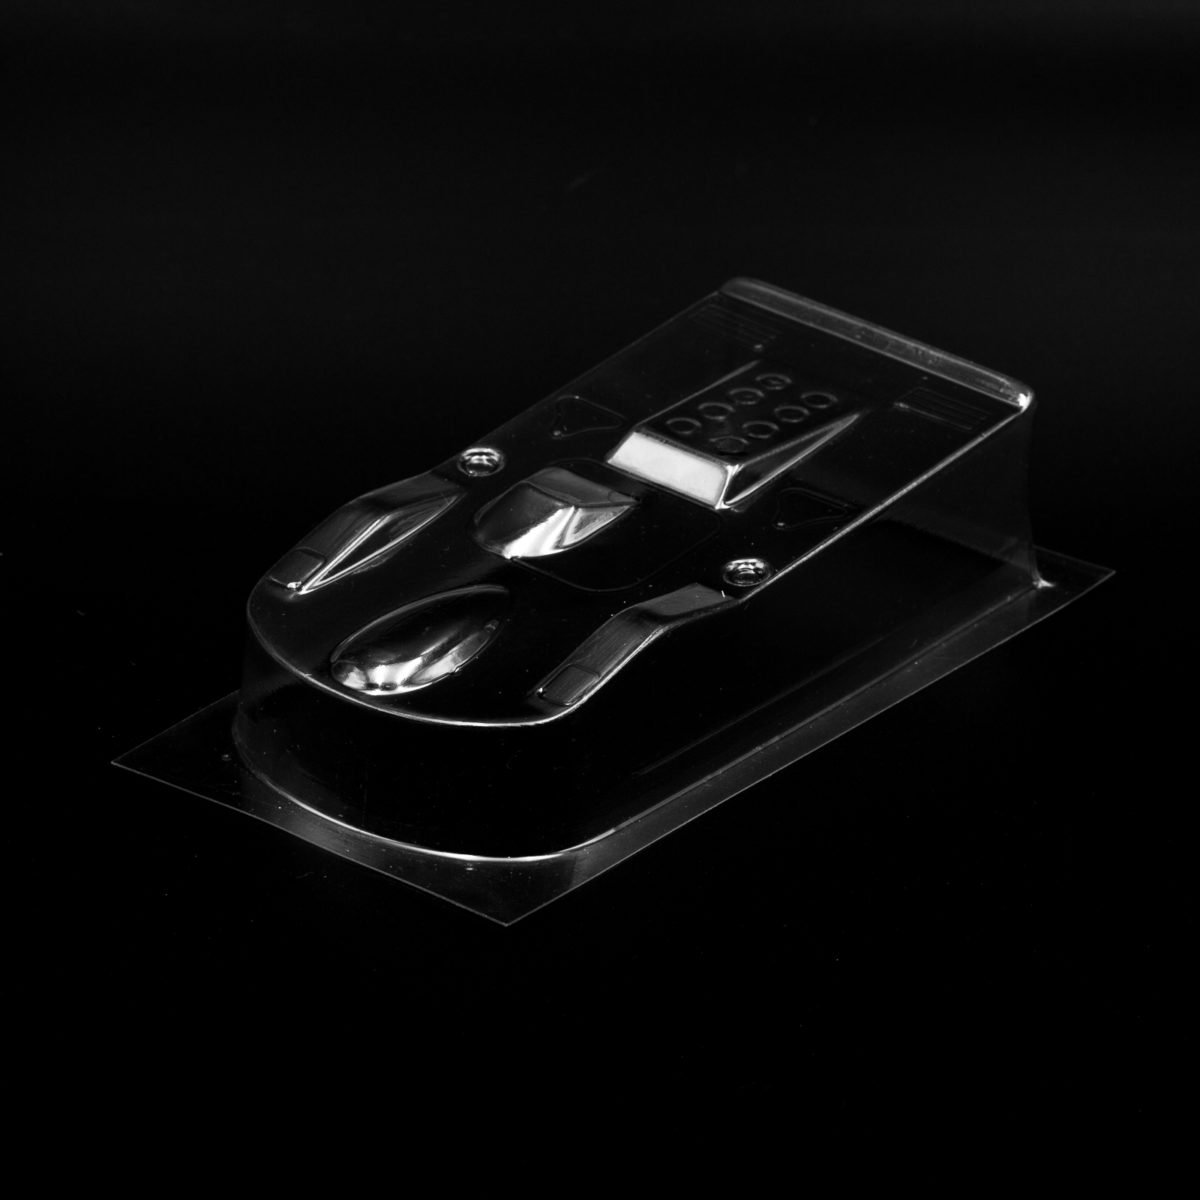 Carrozzeria Slot Car Mini CAN AM 1/32 Trasparente Replica Minidream